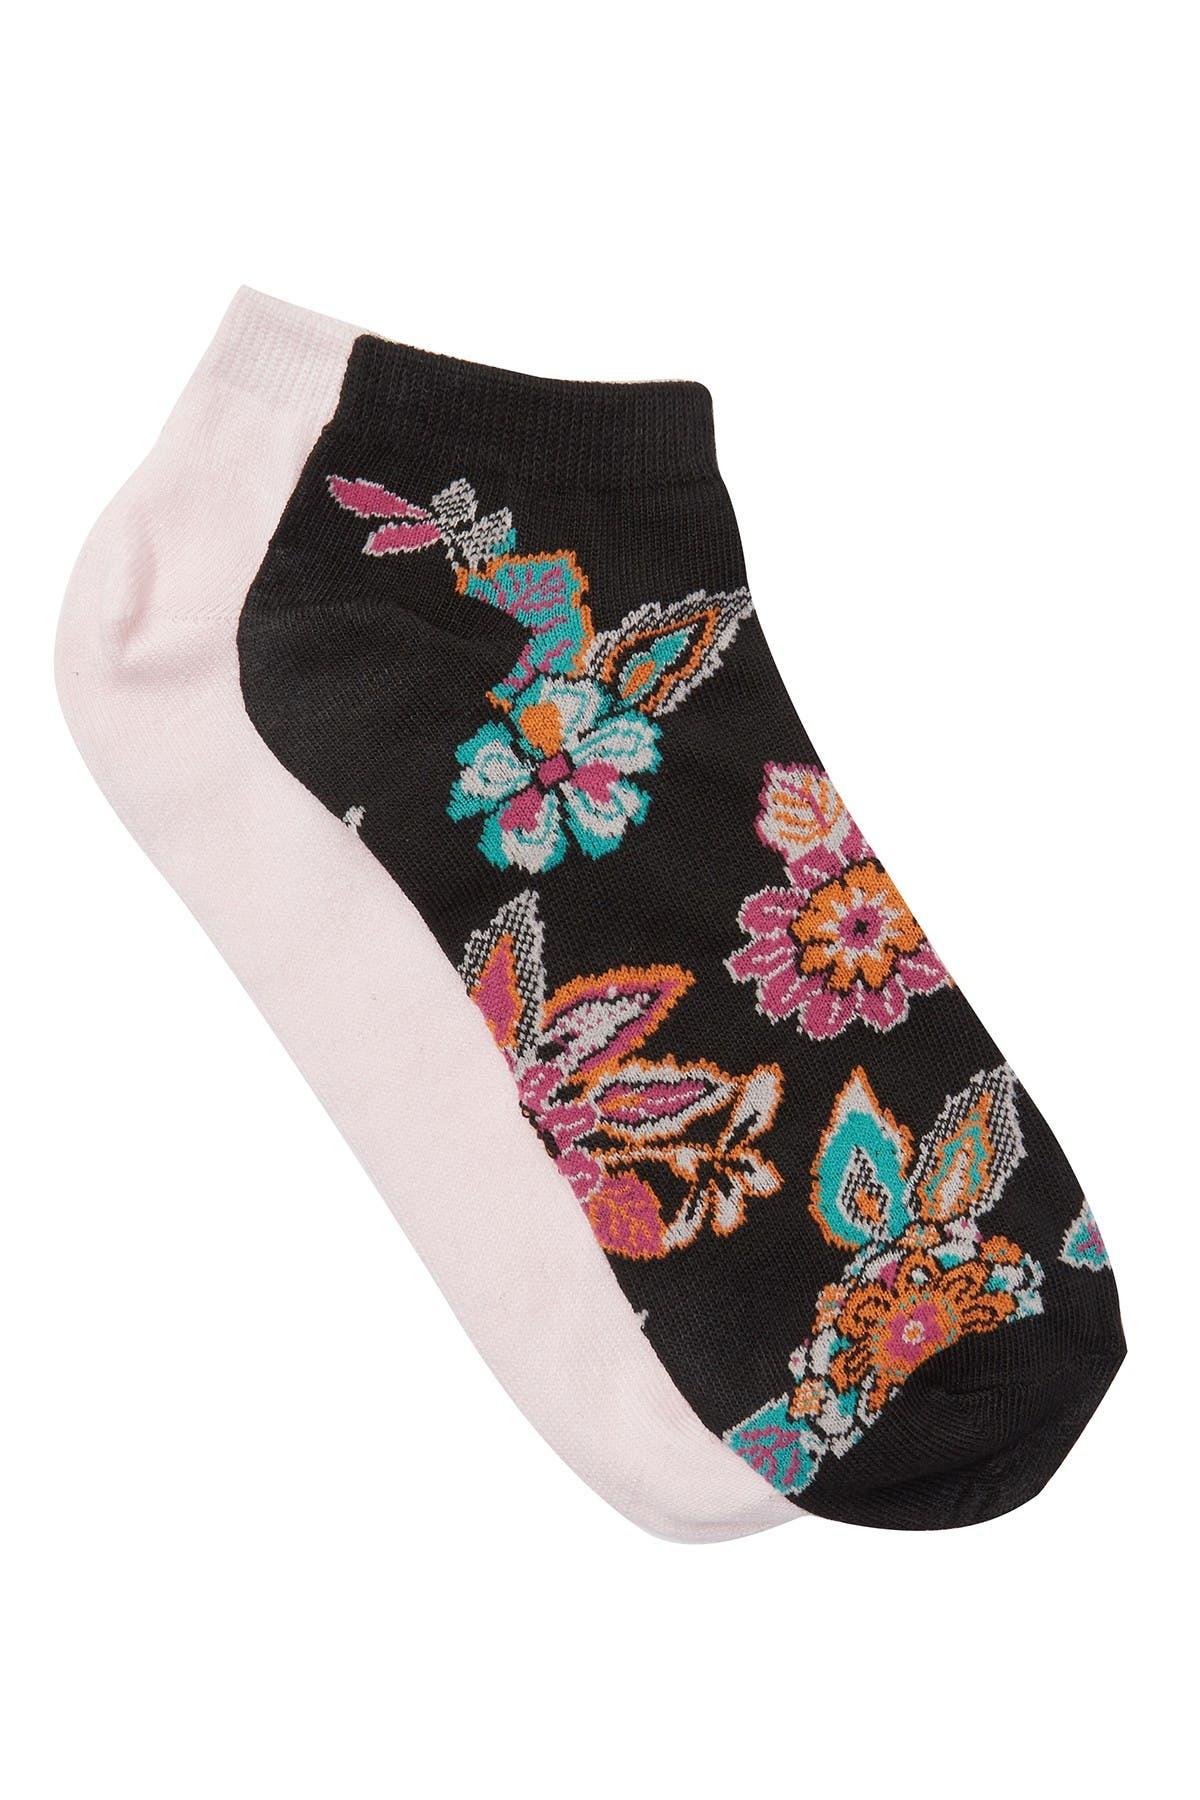 Image of Natori Pop Floral Lowcut Socks - Pack of 2